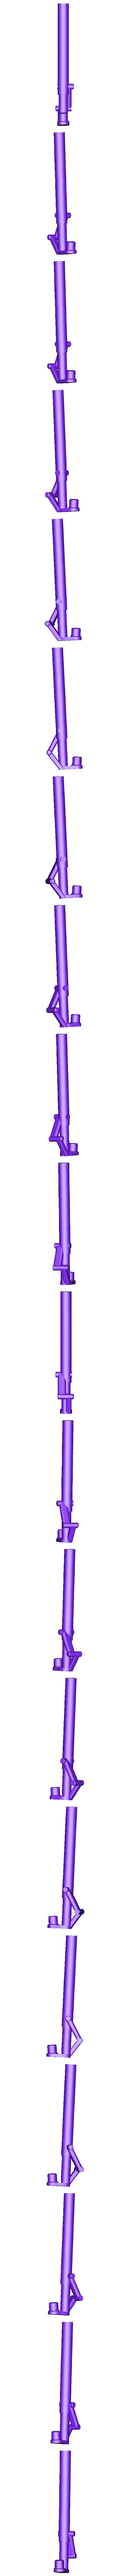 10 - UPPER NOSE LDG.stl Download STL file DOUGLAS F4D SKYRAY  • 3D printer object, 3DprintedArmy